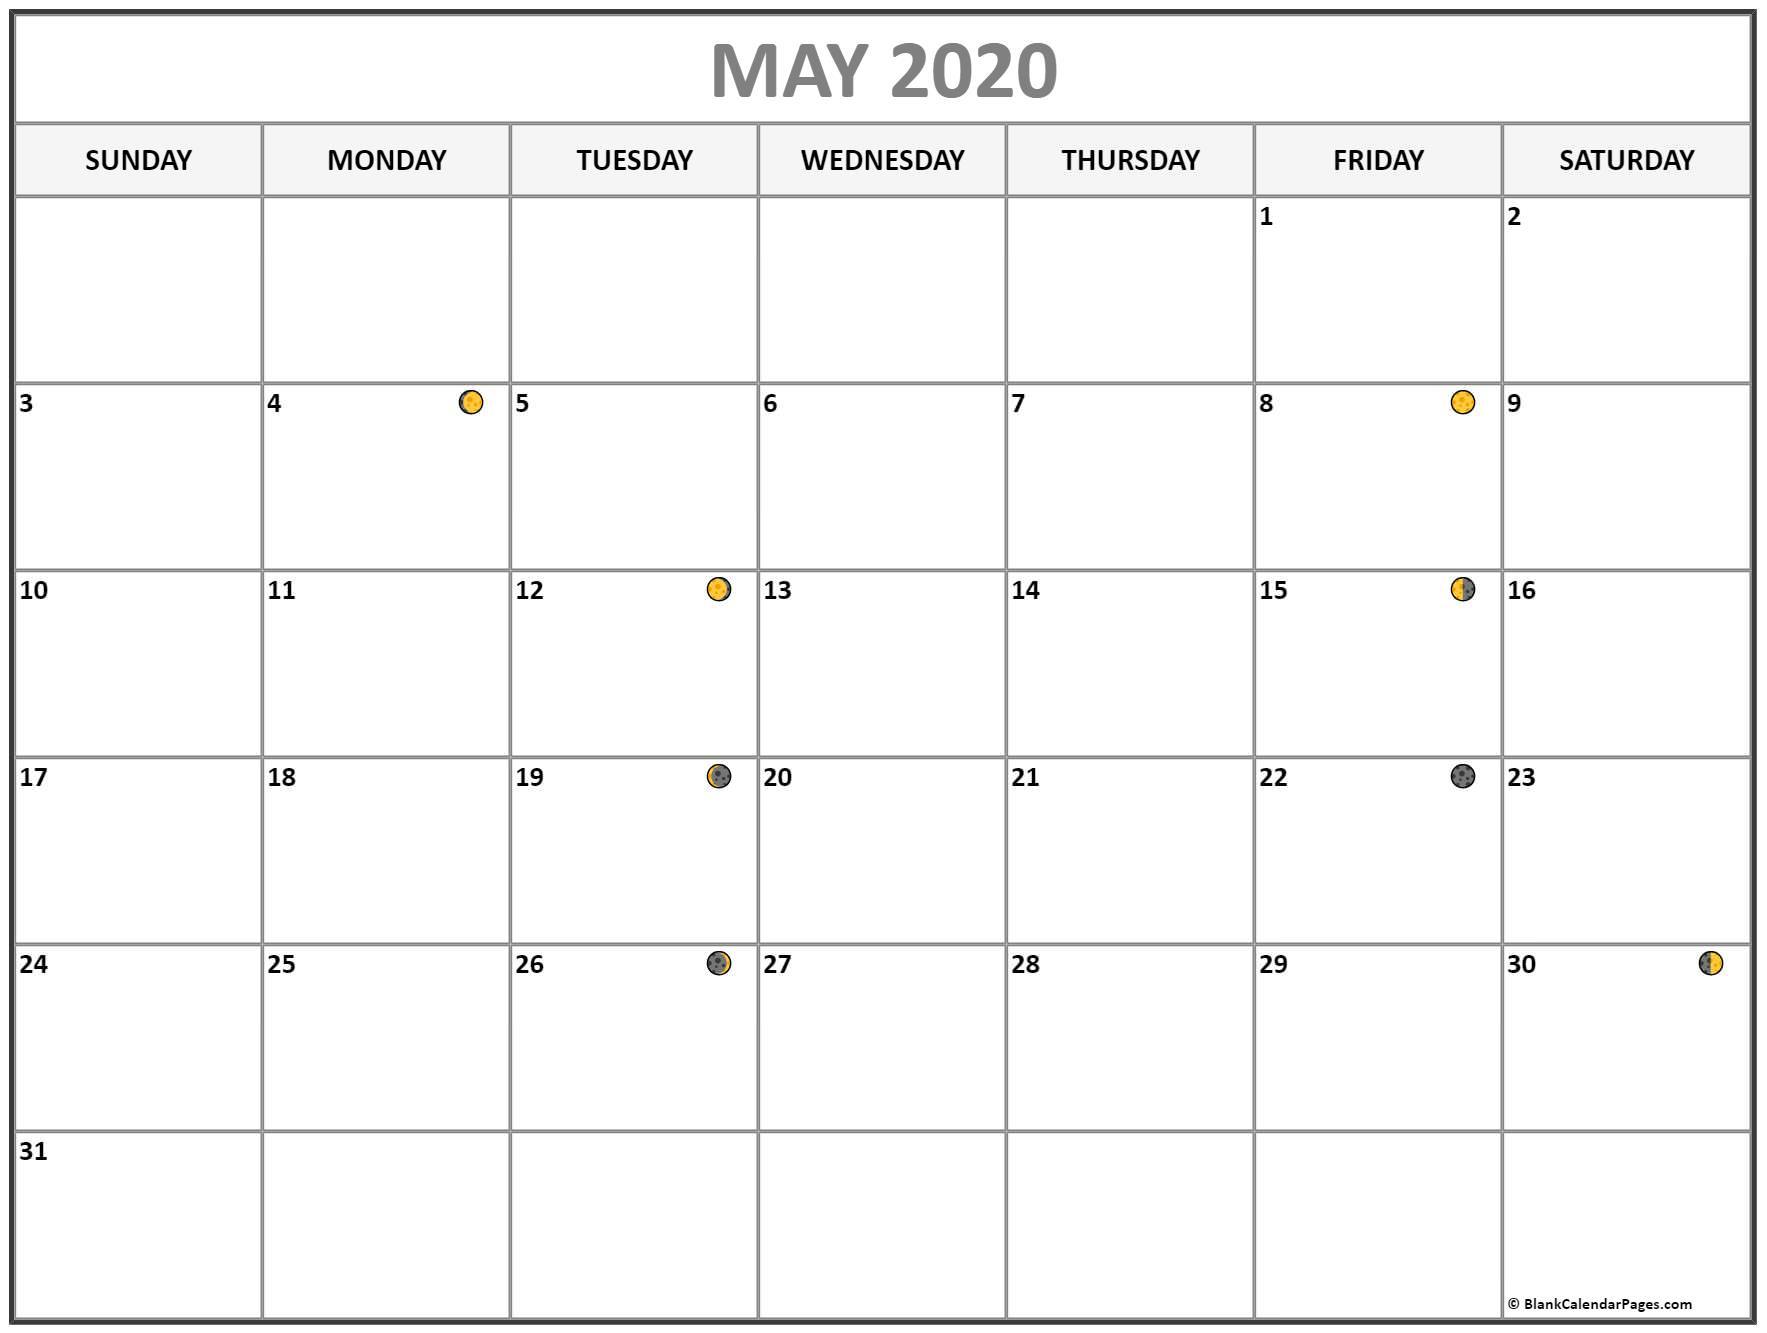 May 2020 Lunar Calendar | Moon Phase Calendar